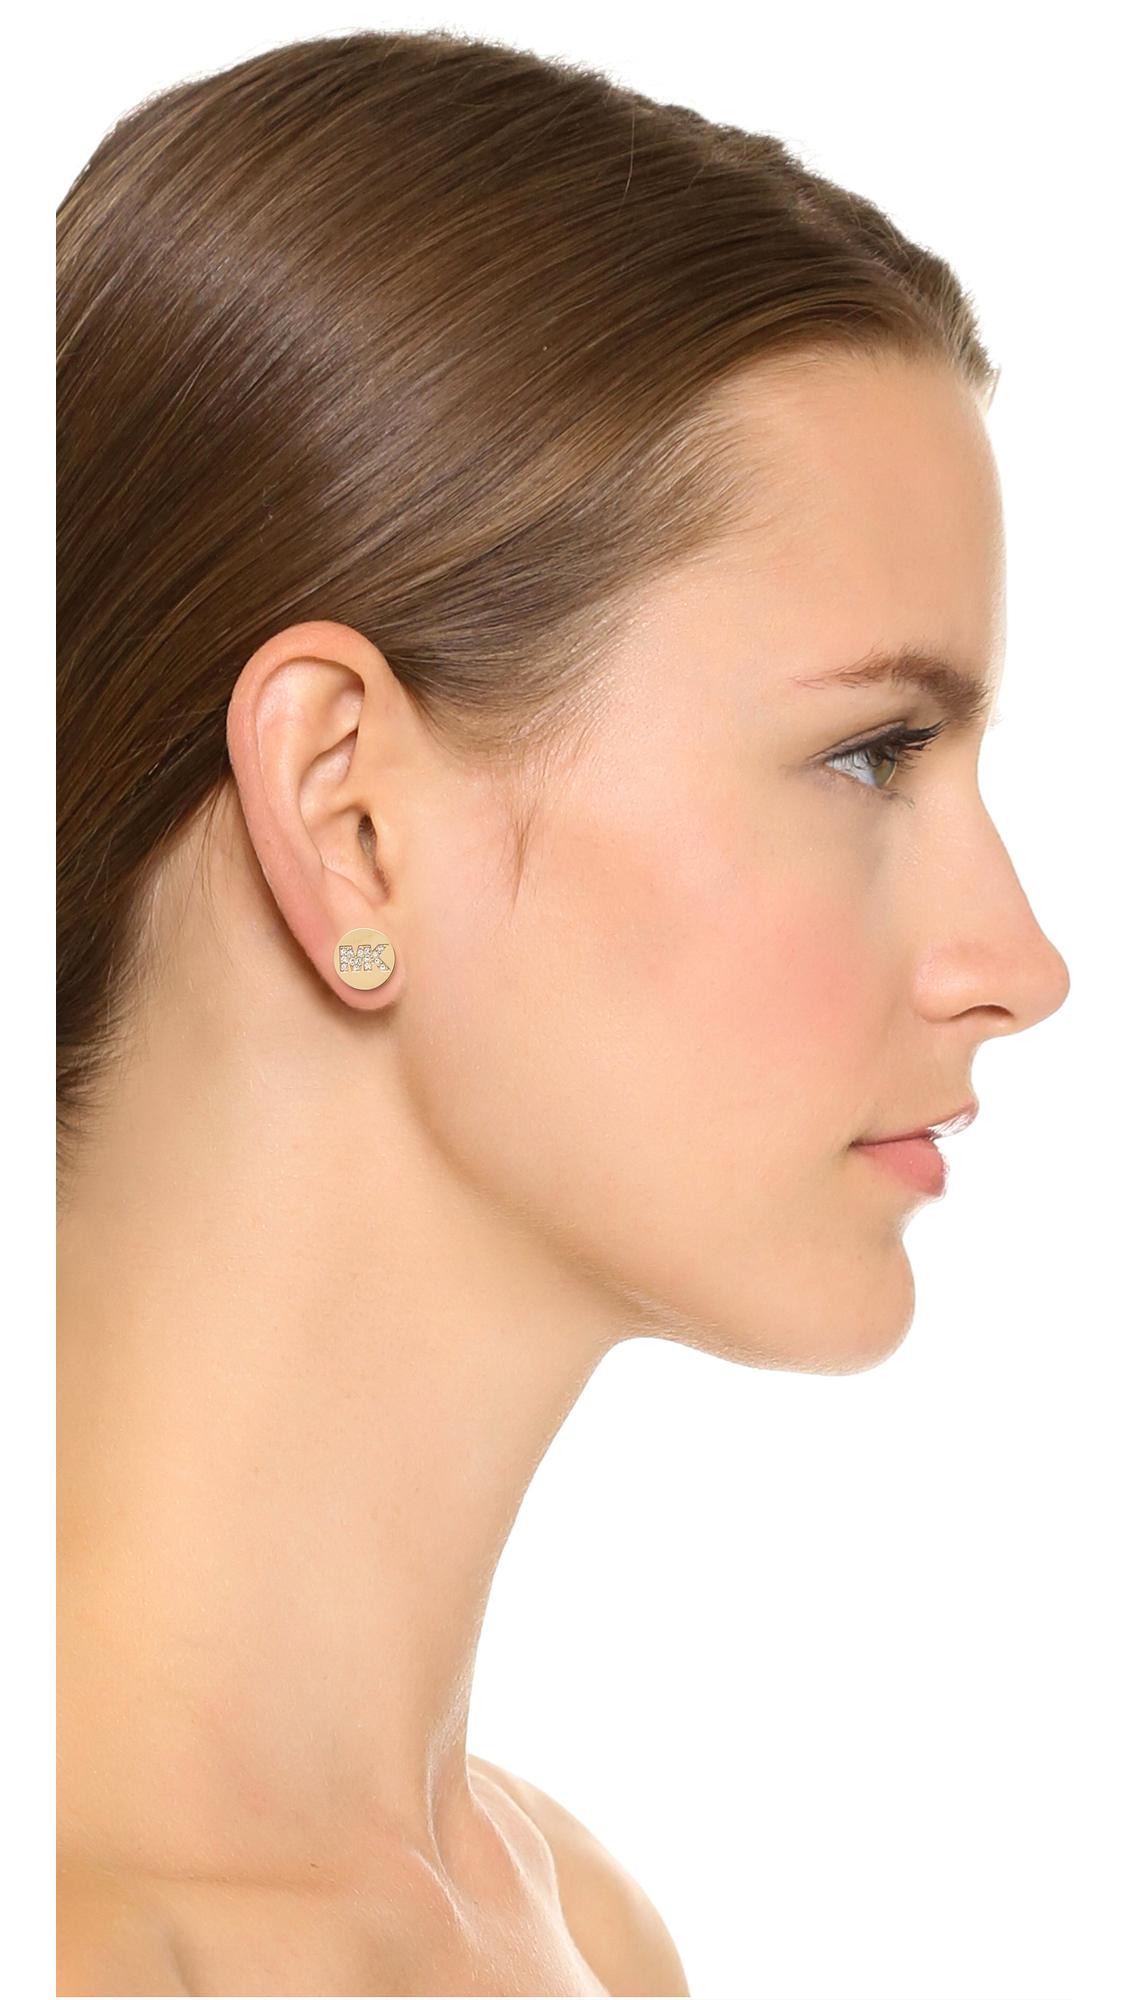 916646839f10 Michael Kors Silver Tone Logo Pave Stud Earrings - The Best Produck ...